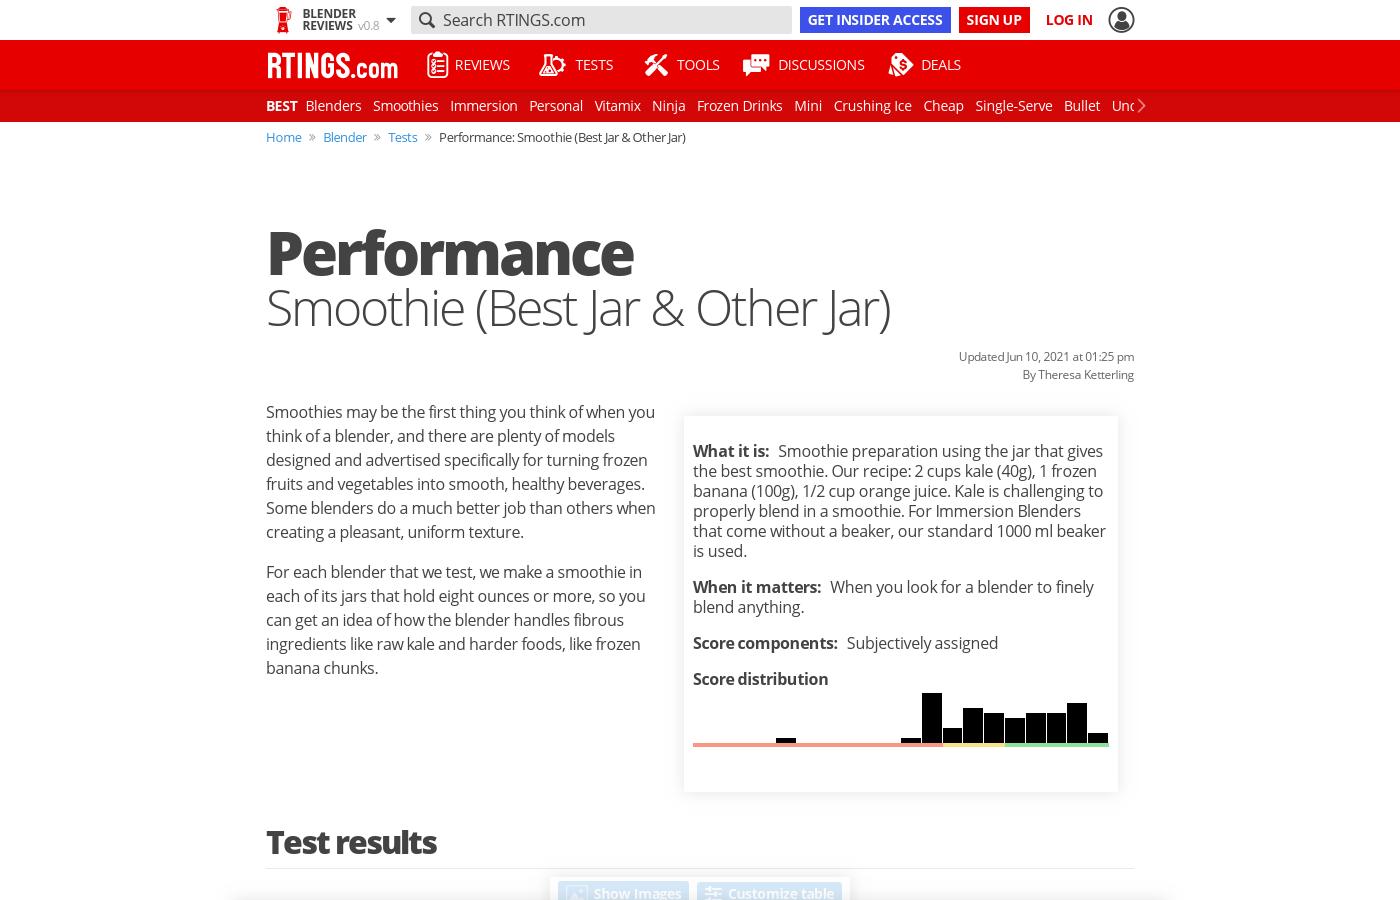 Performance: Smoothie (Best Jar & Other Jar)